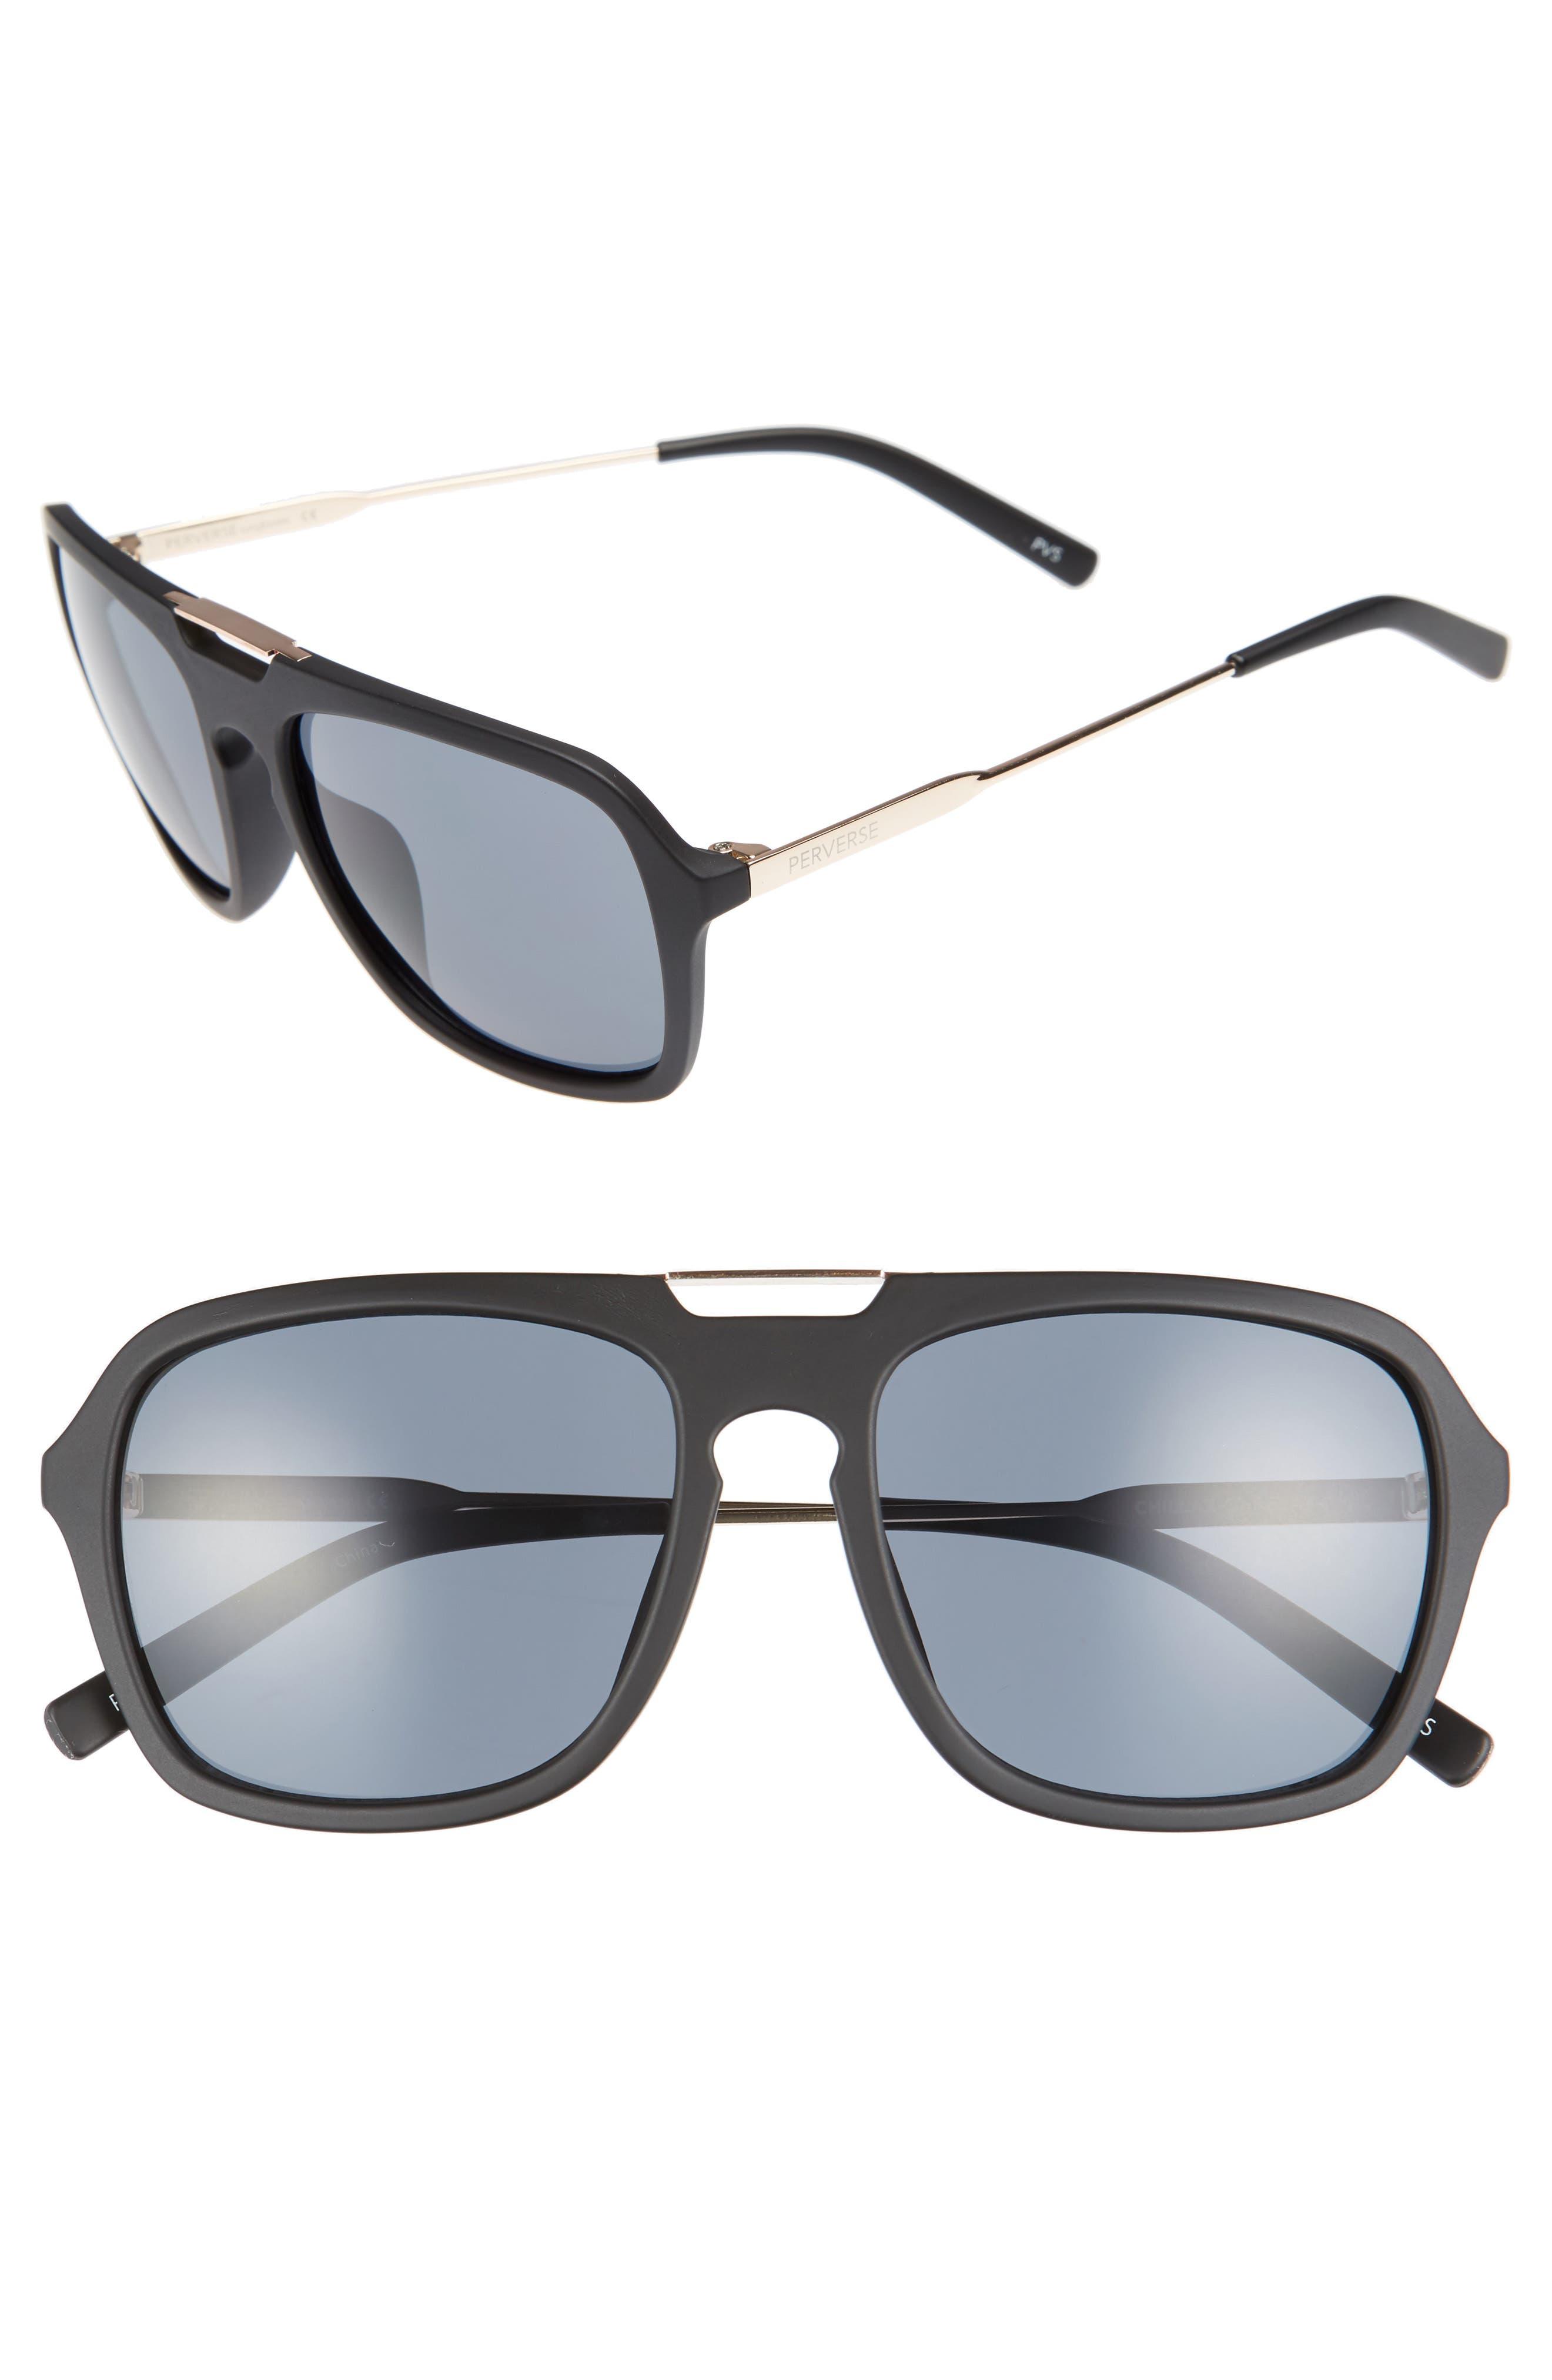 Chillax 55mm Polarized Aviator Sunglasses,                             Main thumbnail 1, color,                             001